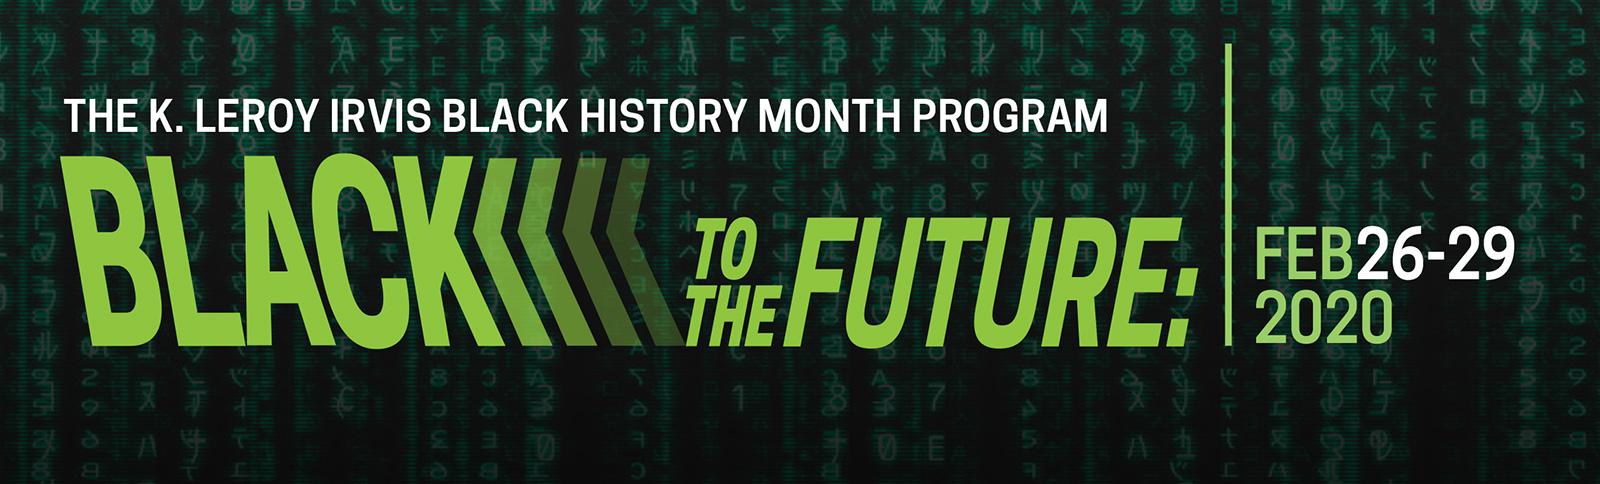 K. Leroy Irvis Black History Month Program